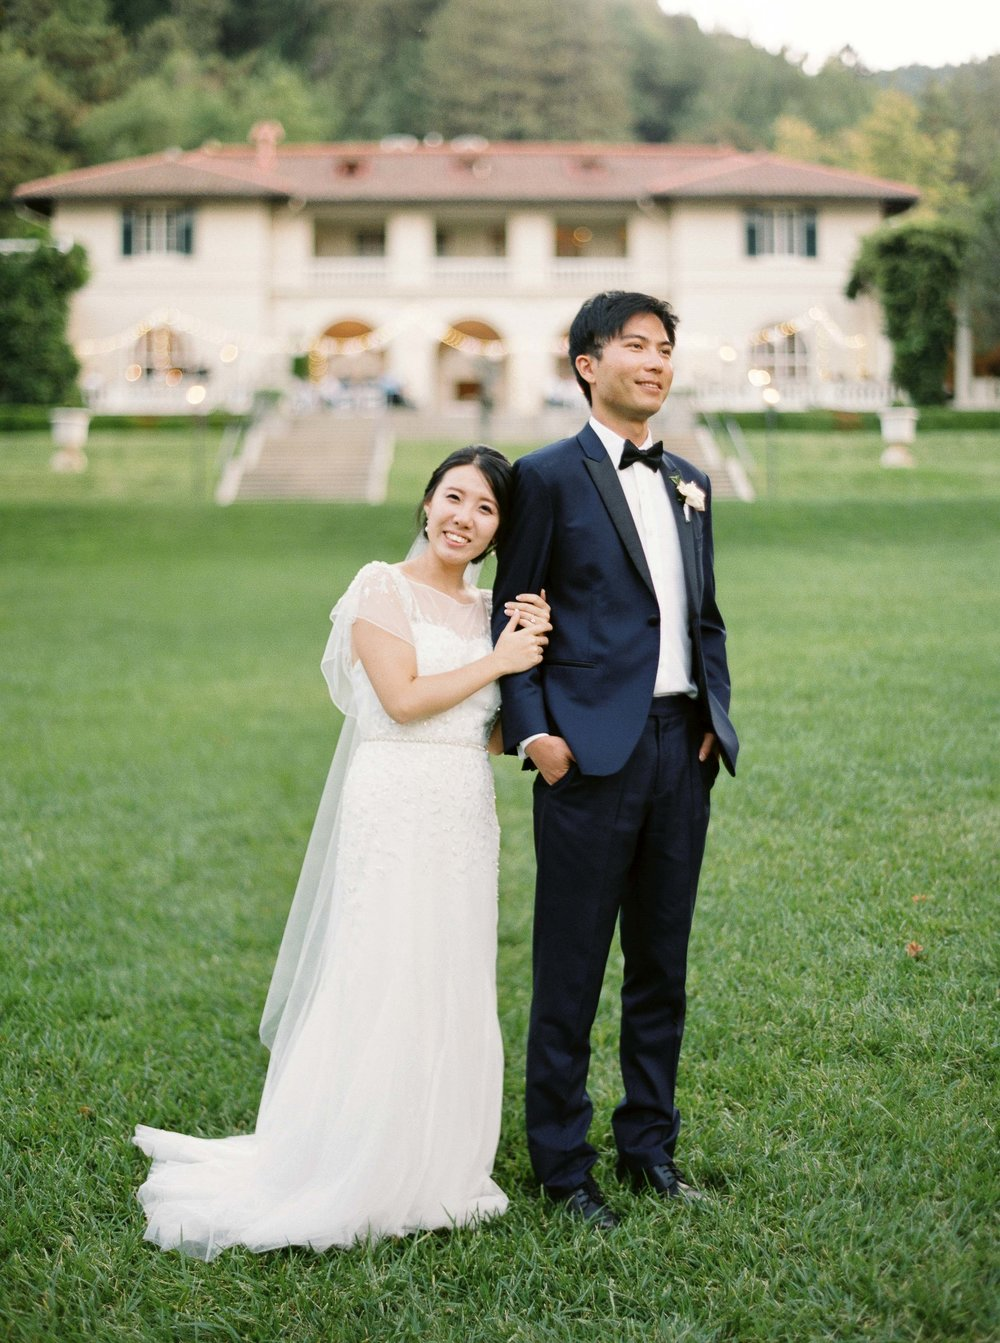 Villa_Montalvo_Wedding_Photographer_Videographer_San_Francisco194.jpg